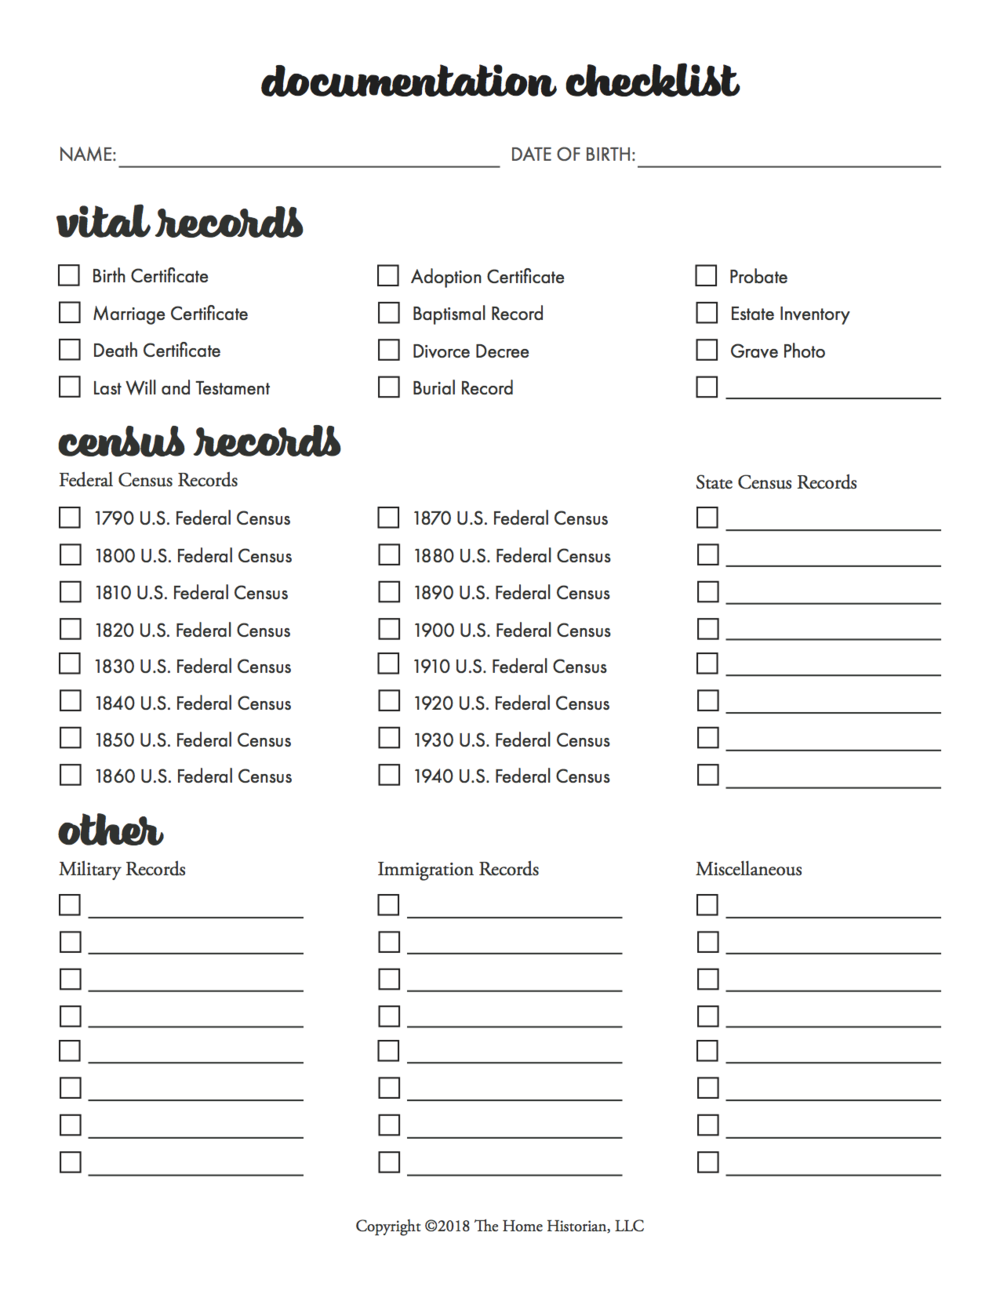 Documentation Checklist.png